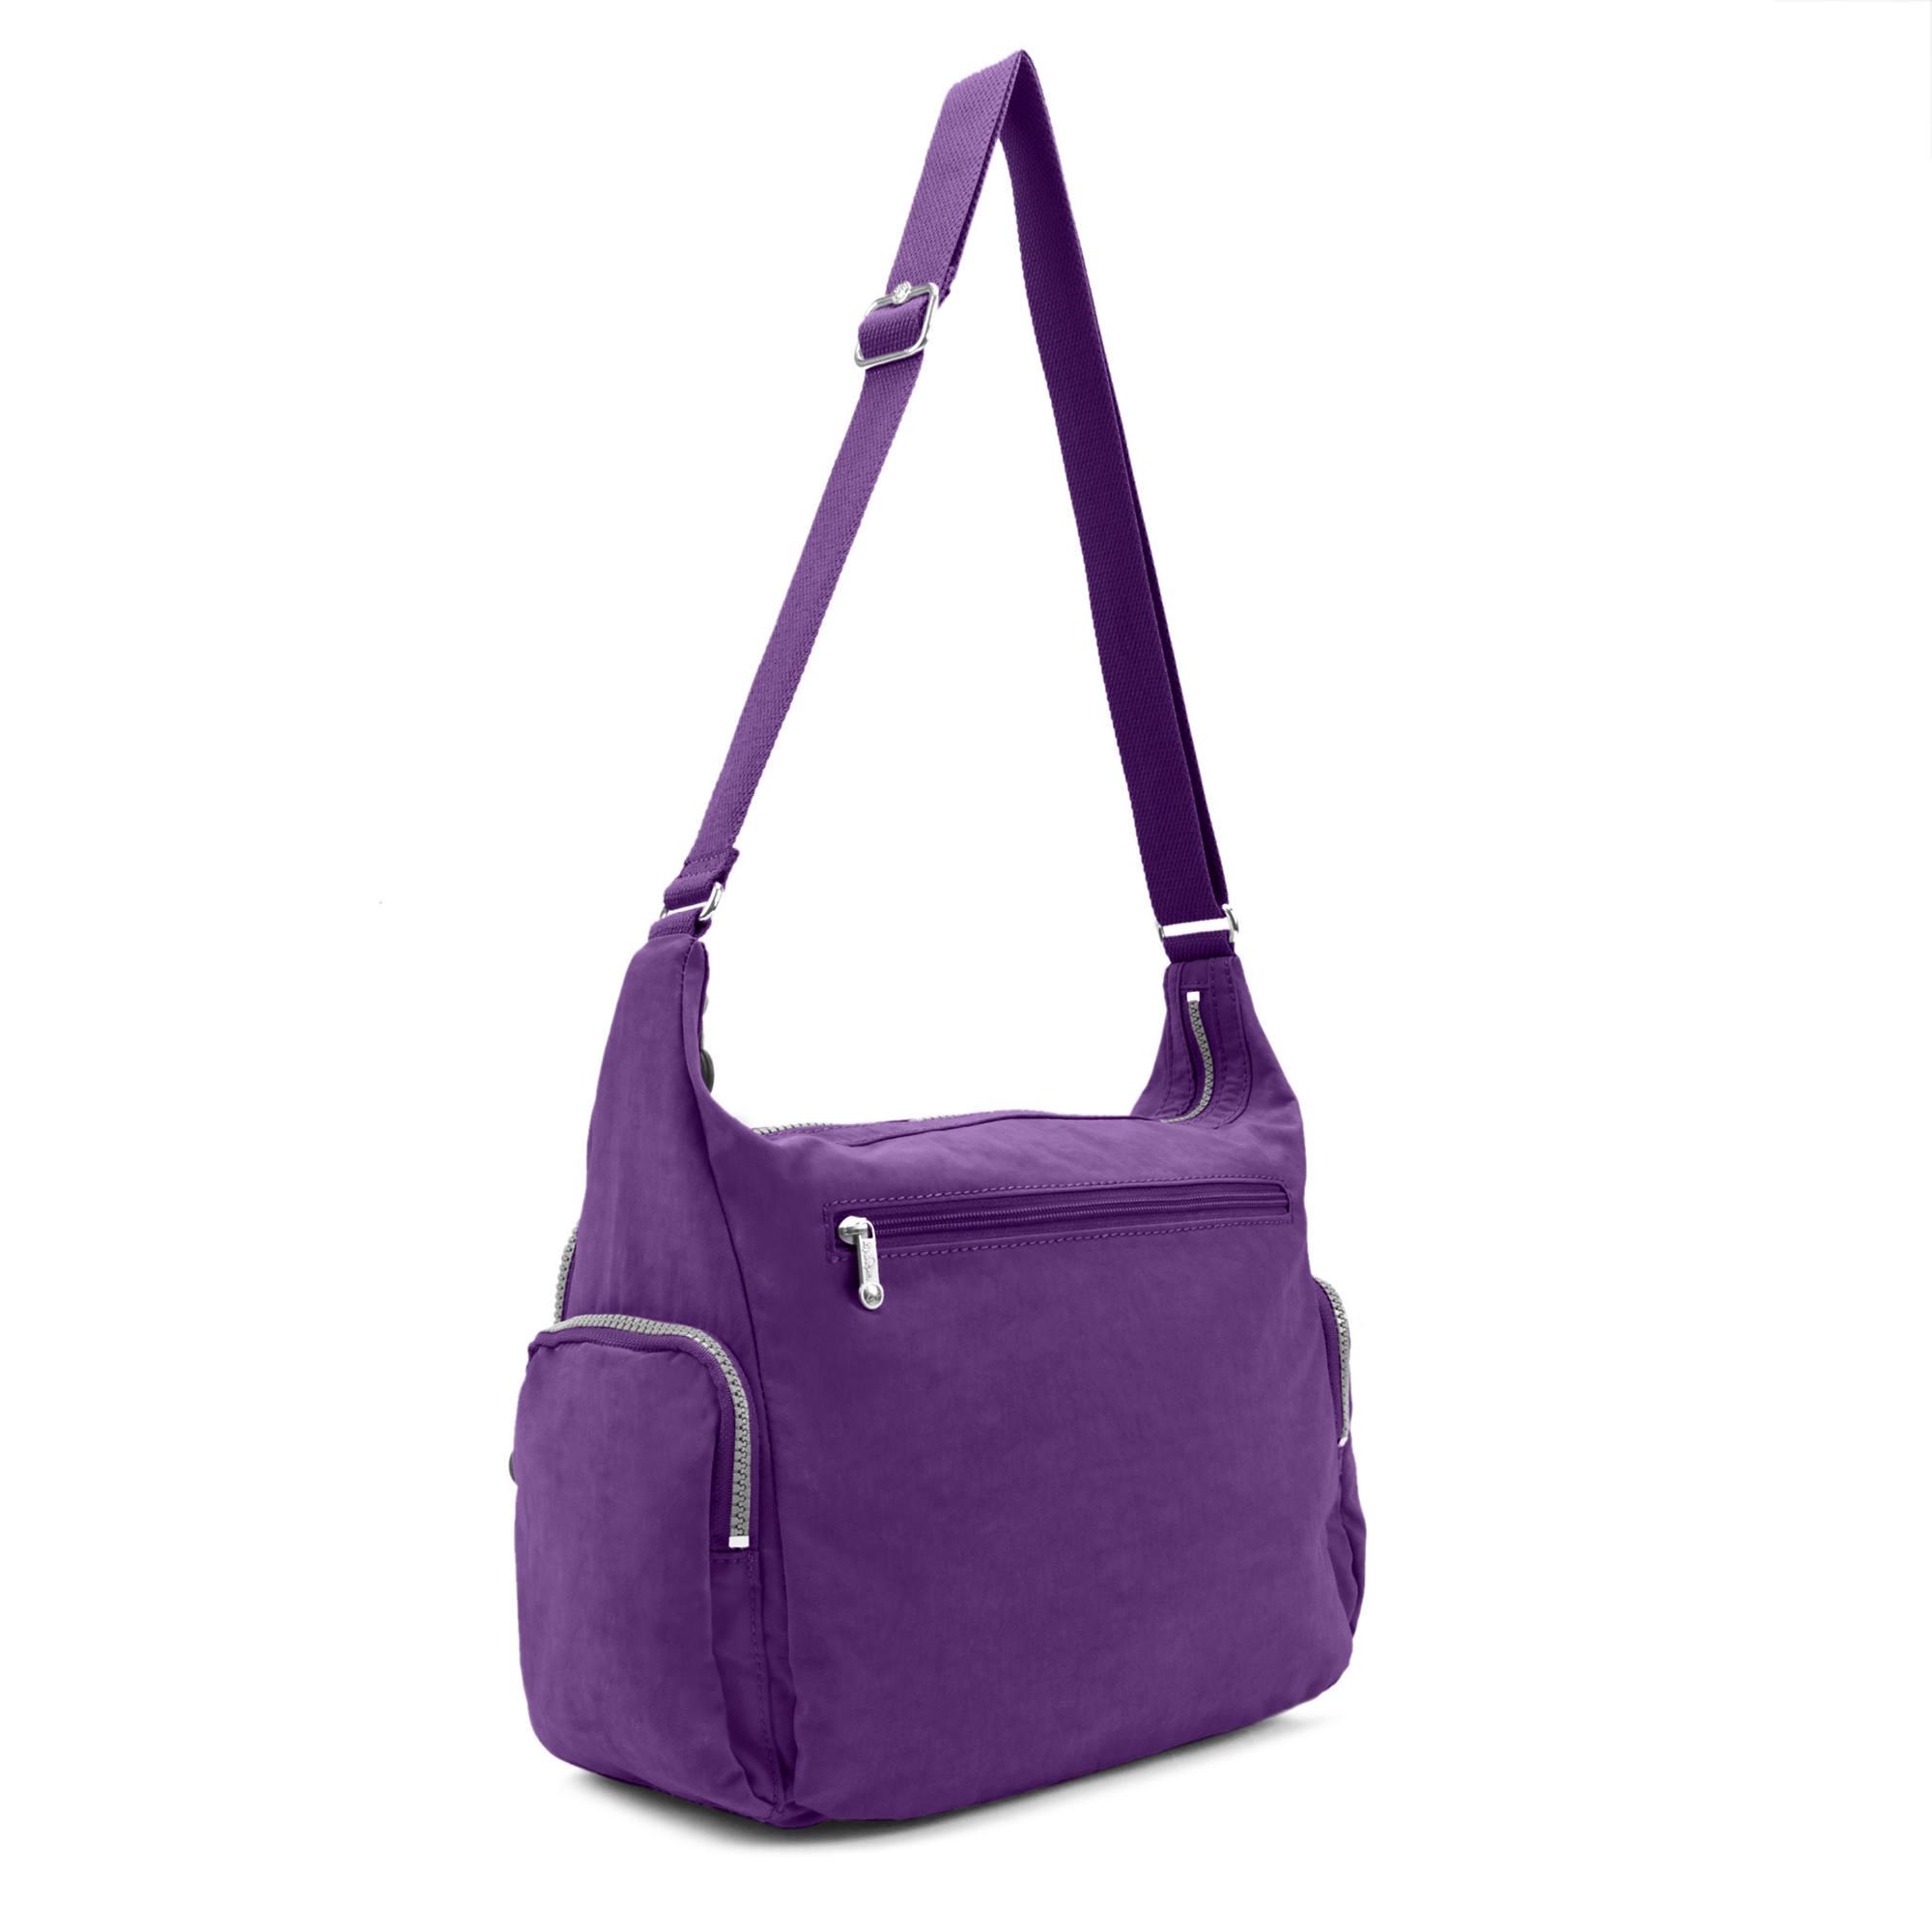 c2c7810ee3 Gabbie Handbag,Pomegranate,large